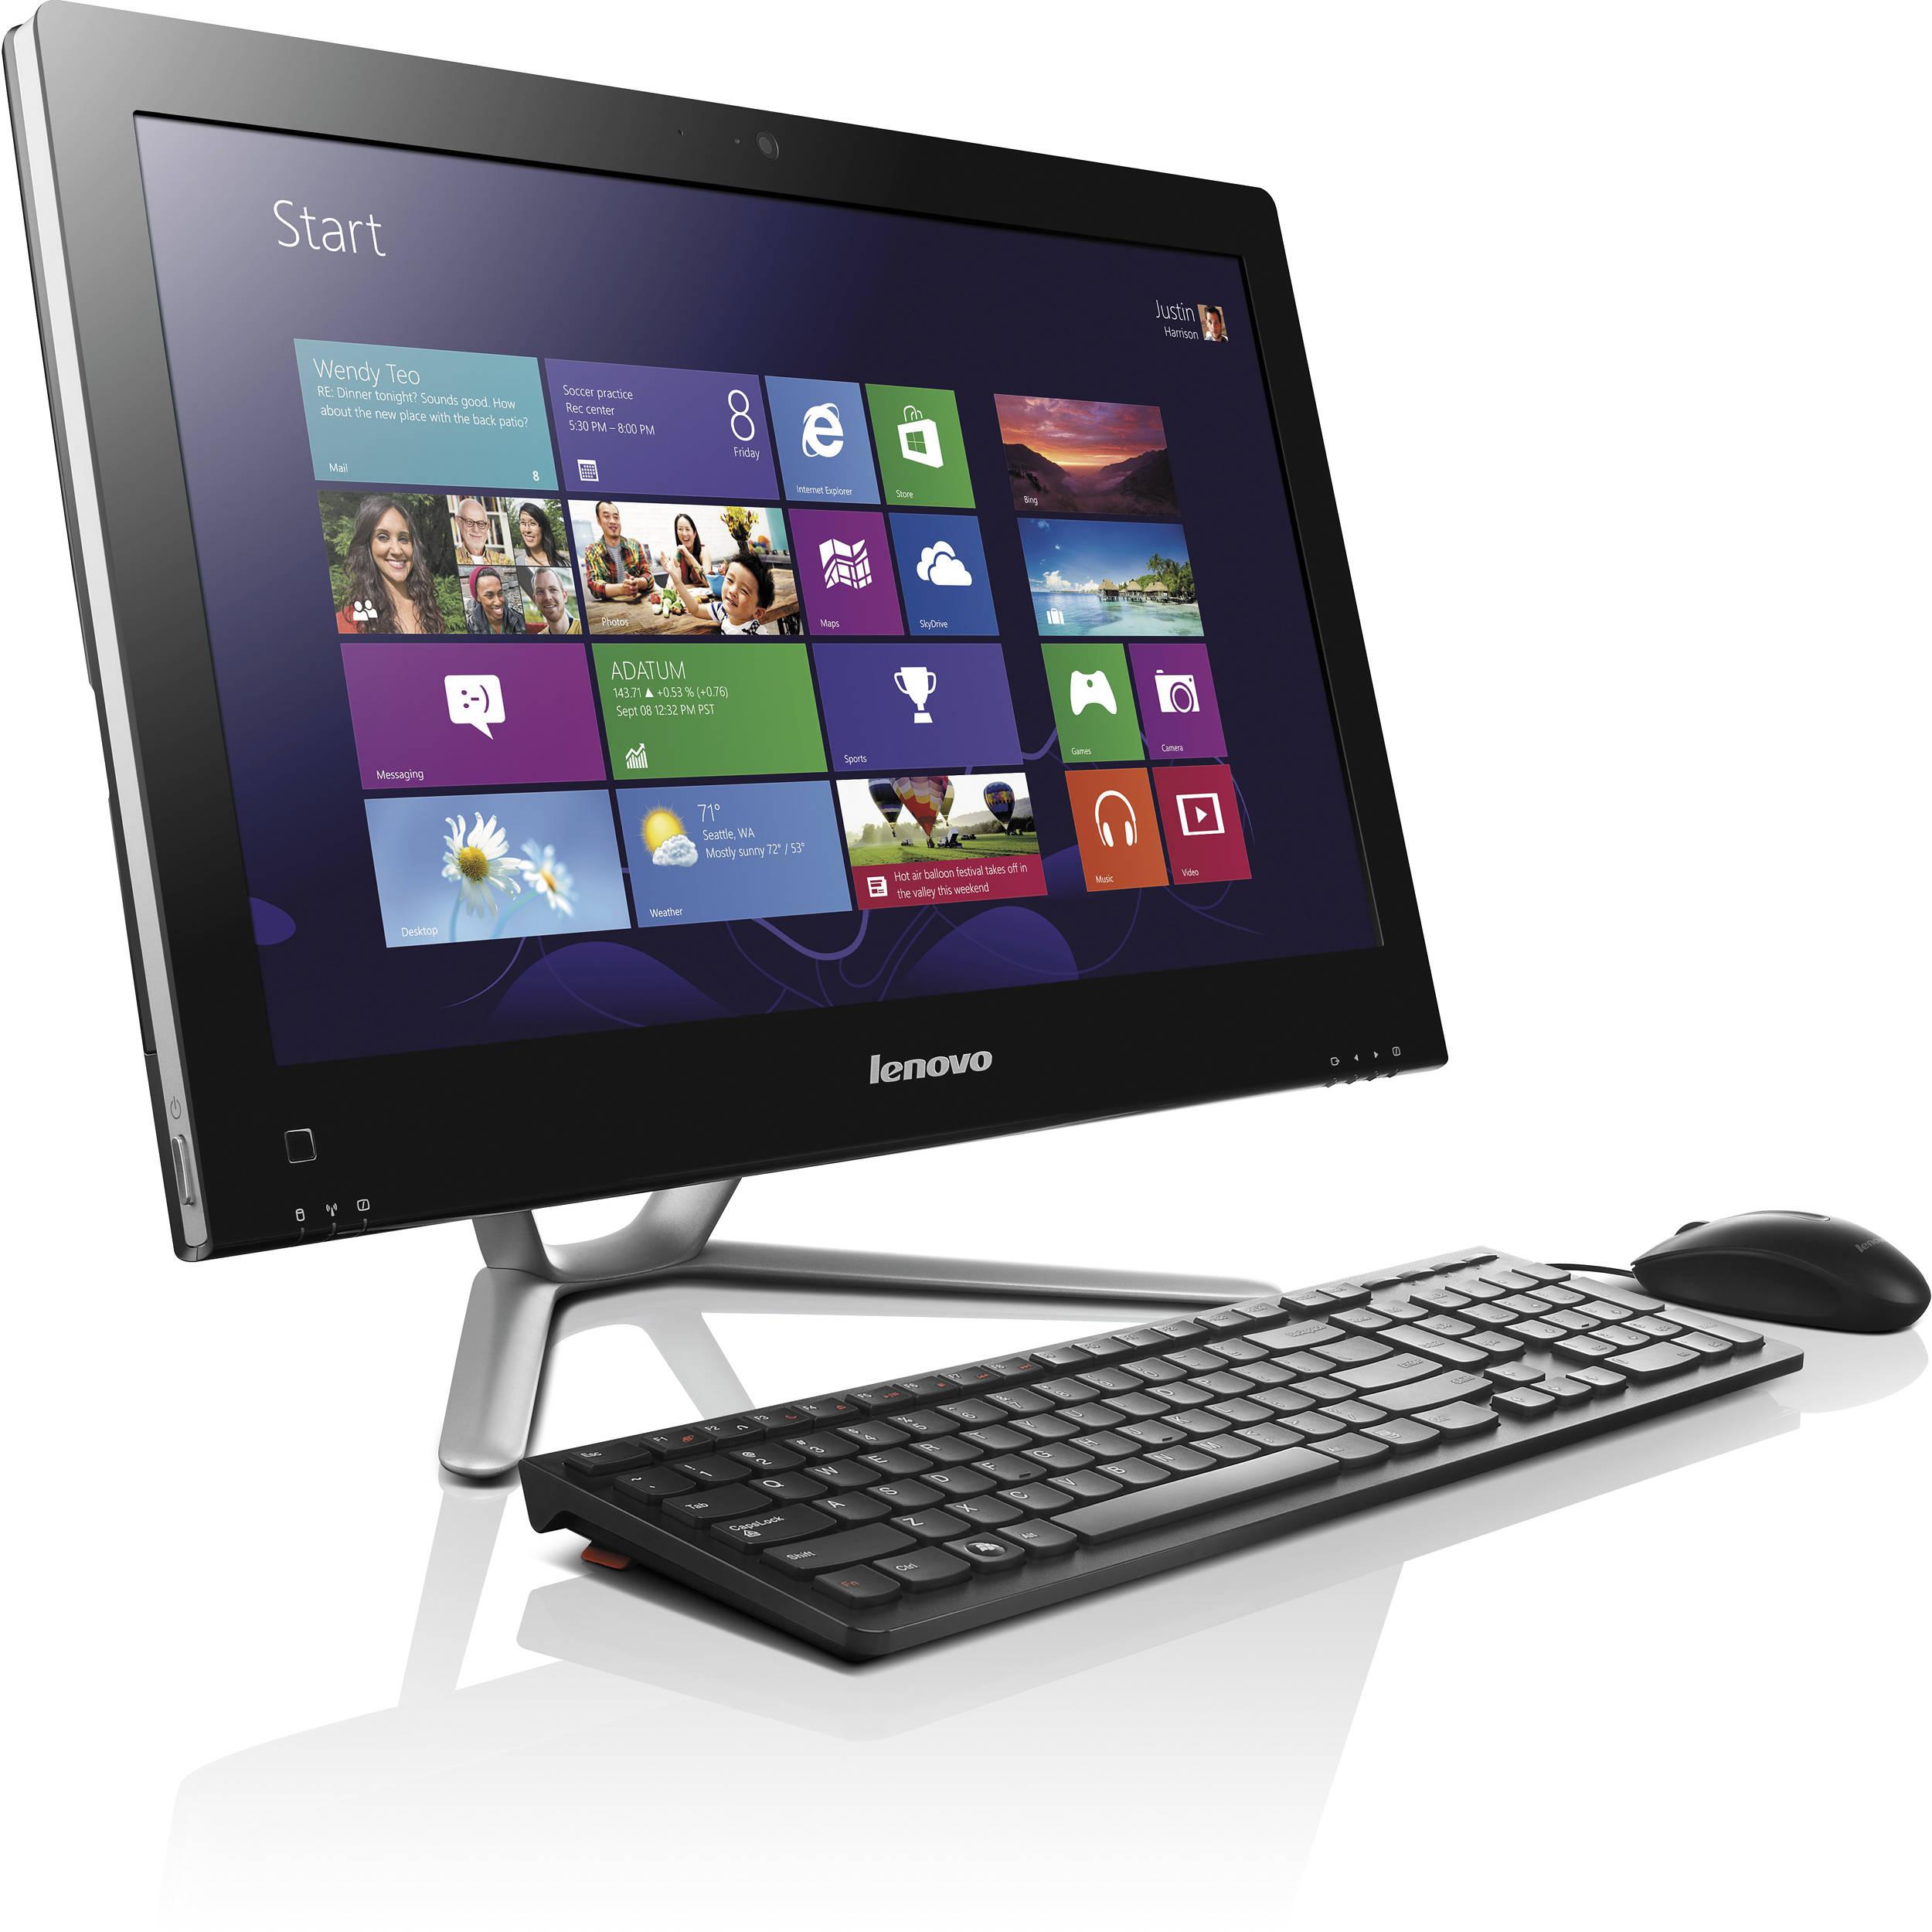 "LENOVO IdeaCentre AIO 510S 23"" Touchscreen All-in-One PC ... |Lenovo Desktop All In One"